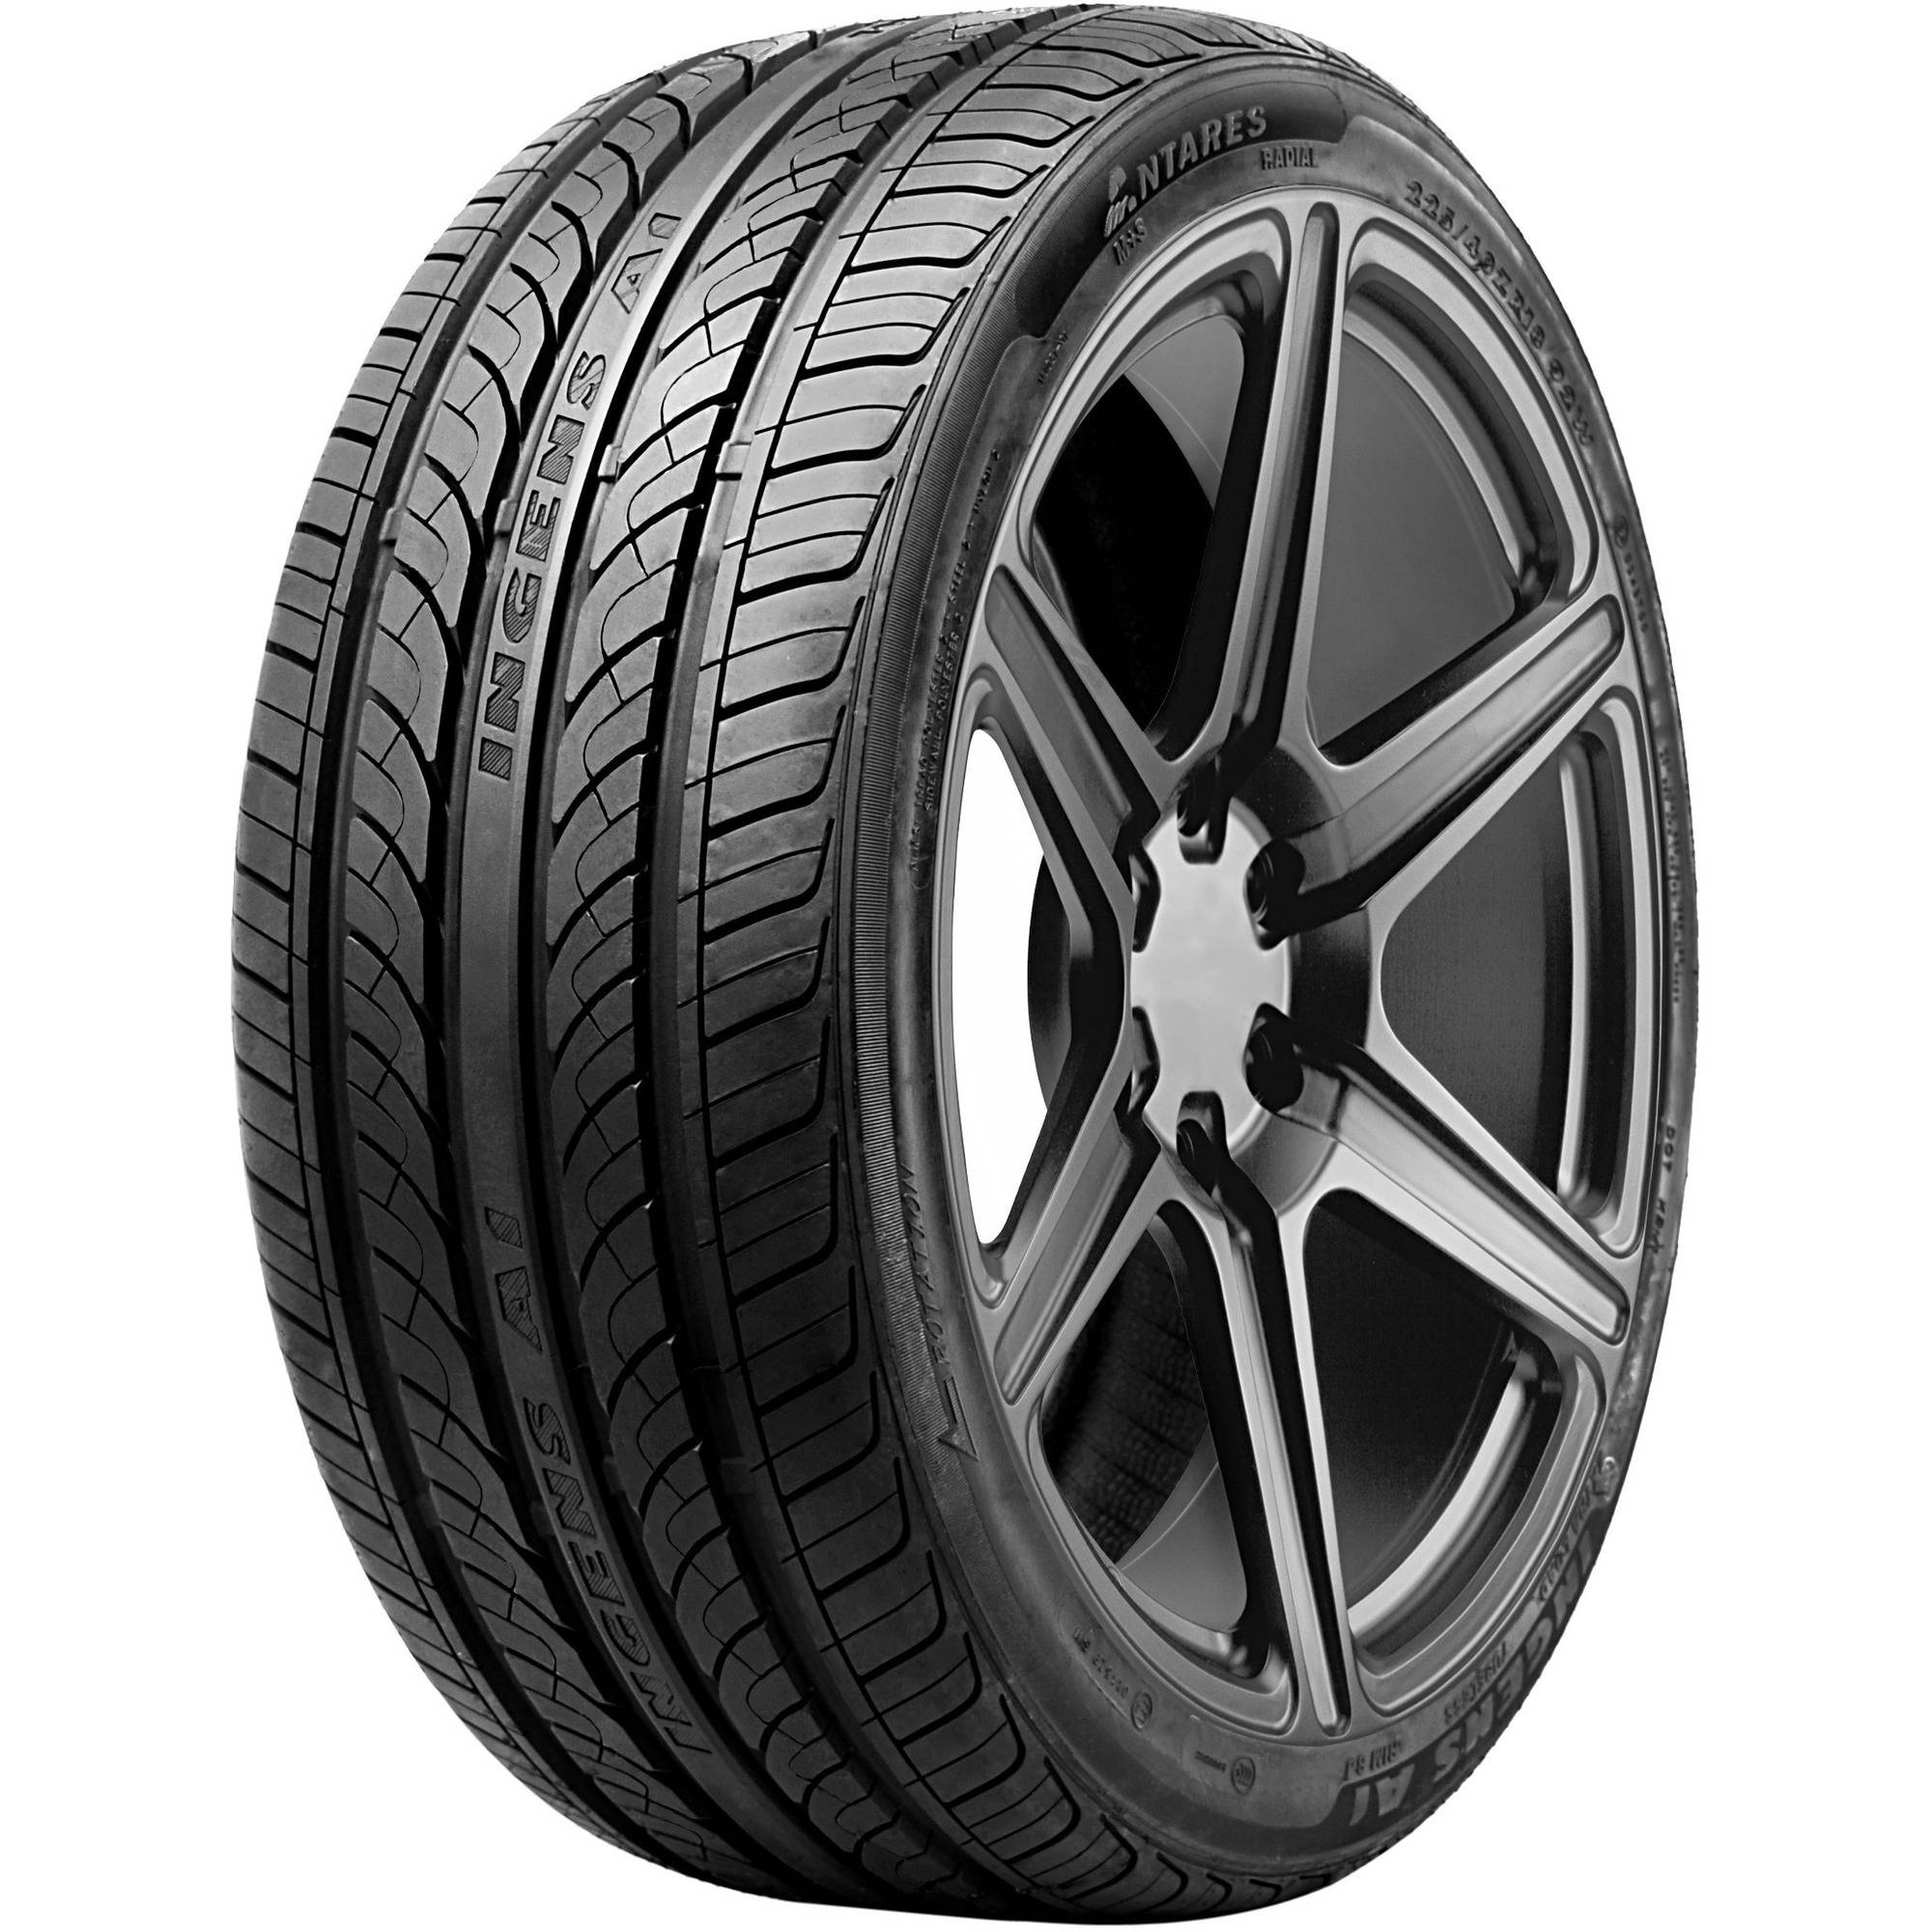 Cooper CS3 Touring 100T Tire 225 65R16 Walmart